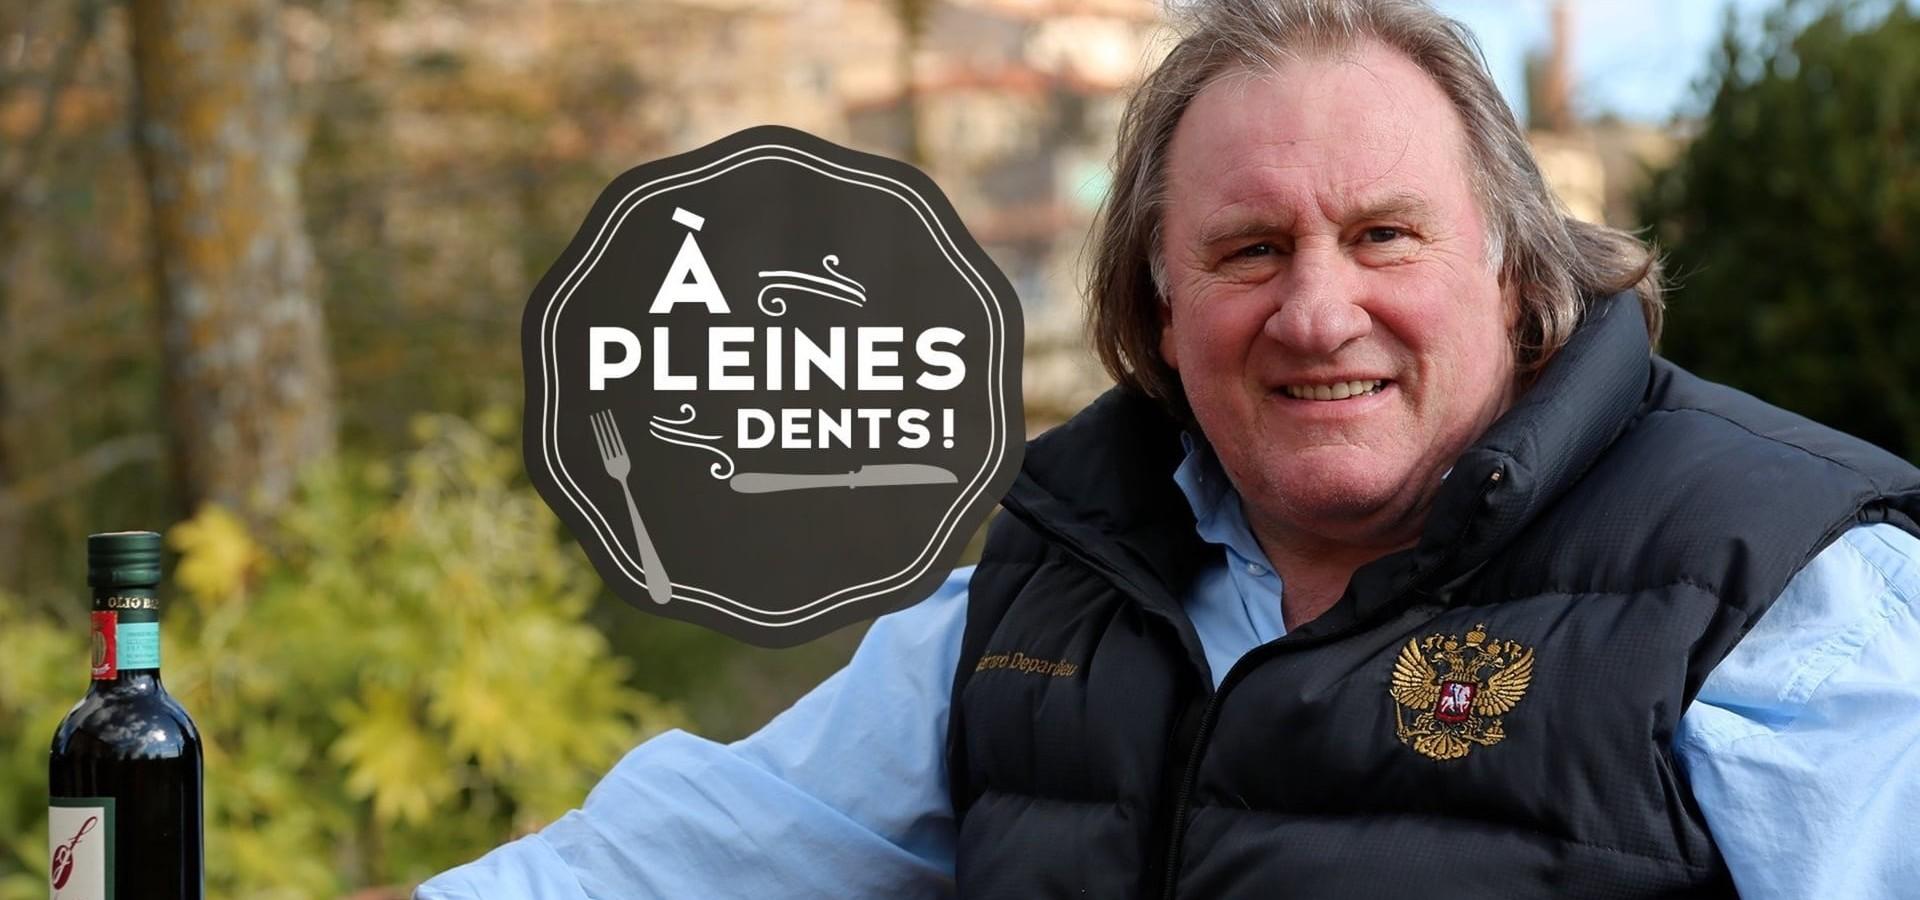 Bon appetit: Gérard Depardieu's Europe